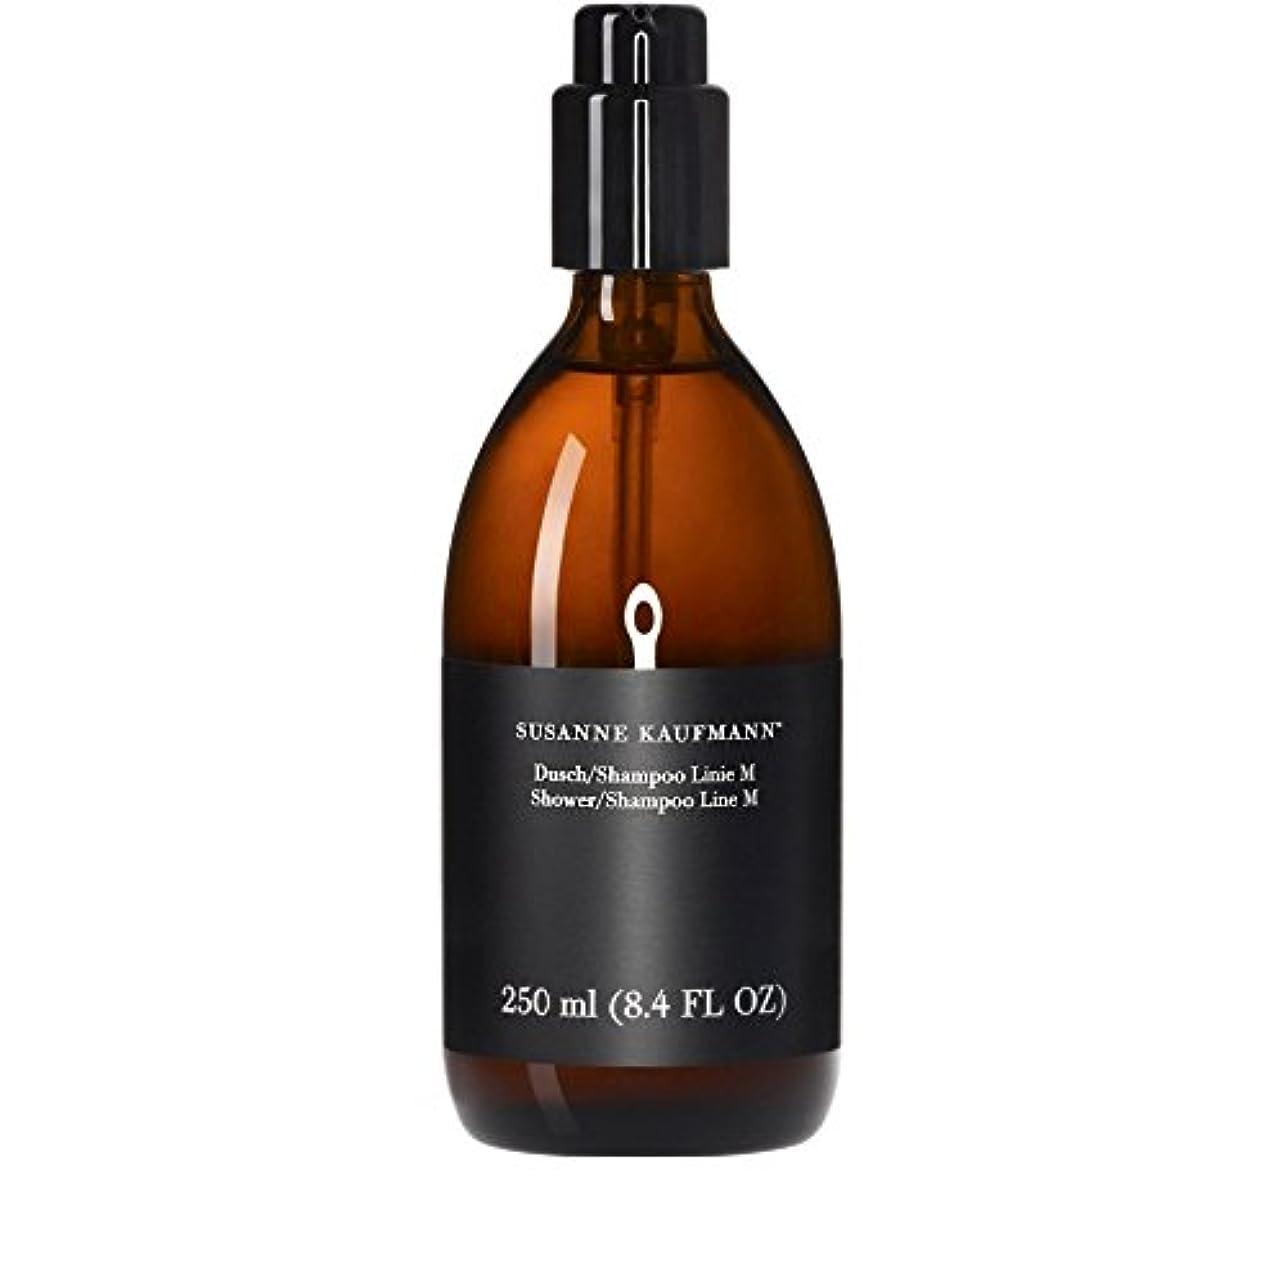 Susanne Kaufmann Shower/Shampoo for Men 250ml - 男性のためのスザンヌカウフマンシャワー/シャンプー250ミリリットル [並行輸入品]